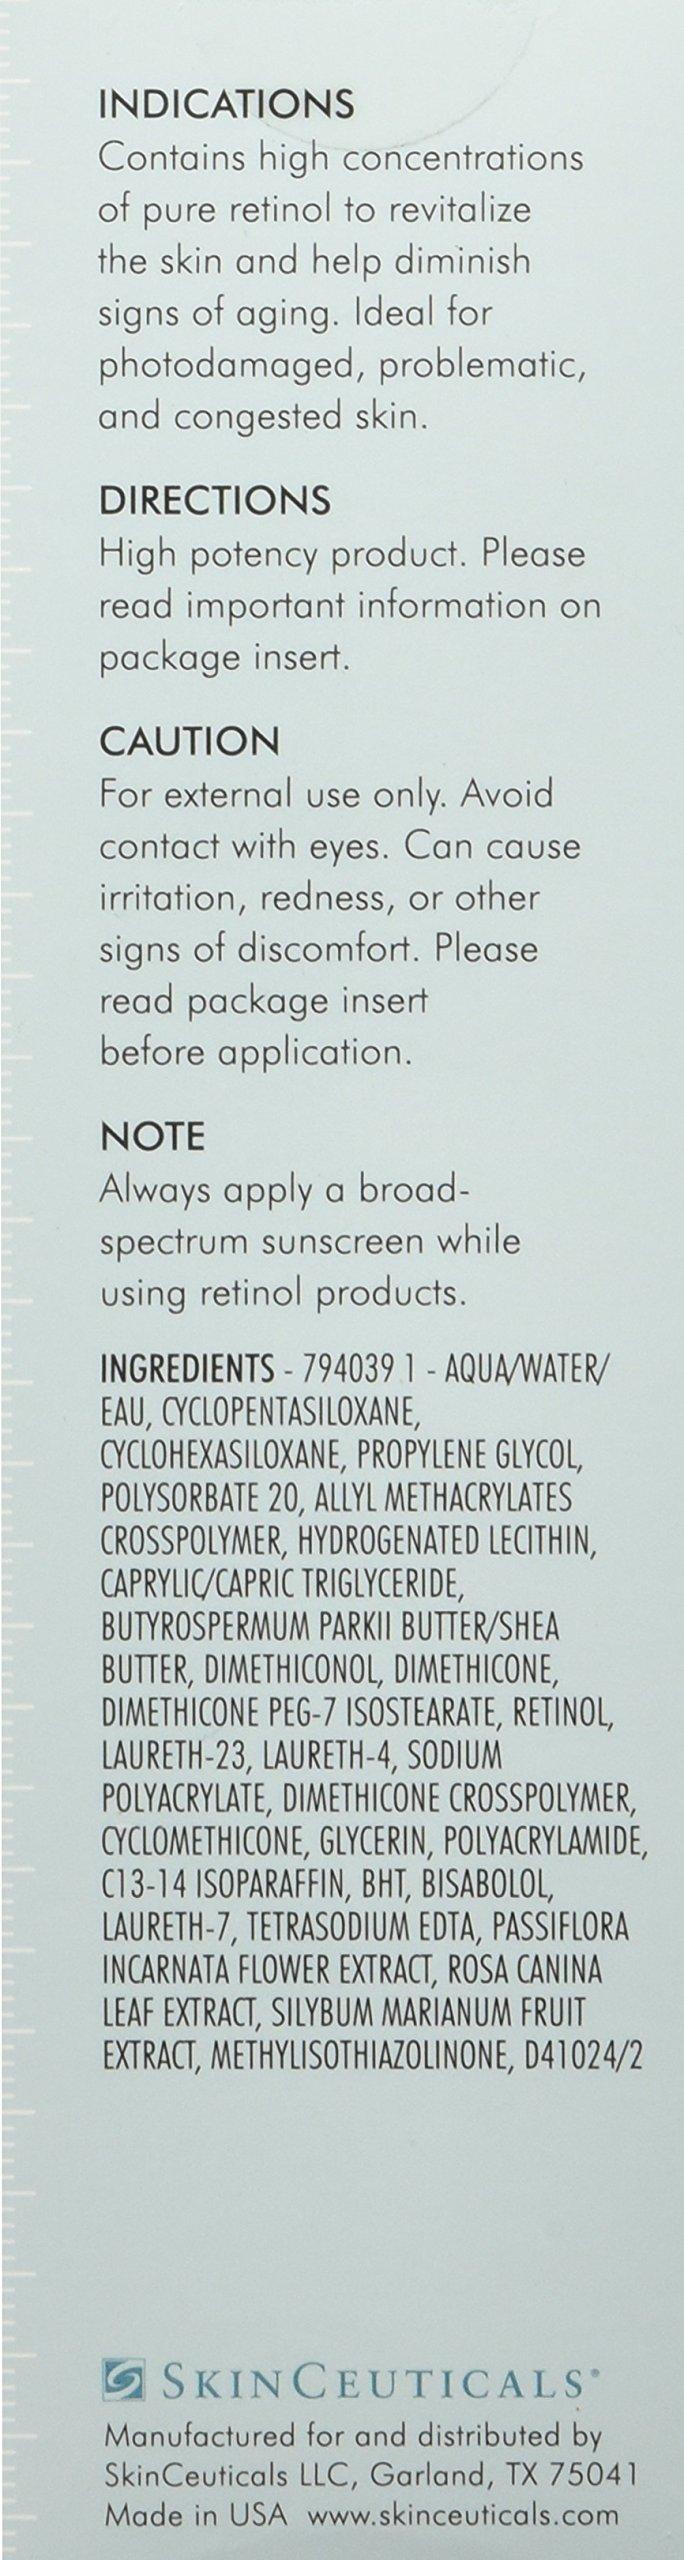 Skinceuticals Retinol 1 Maximum Strength Refining Night Cream, 1 Fluid Ounce by SkinCeuticals (Image #2)